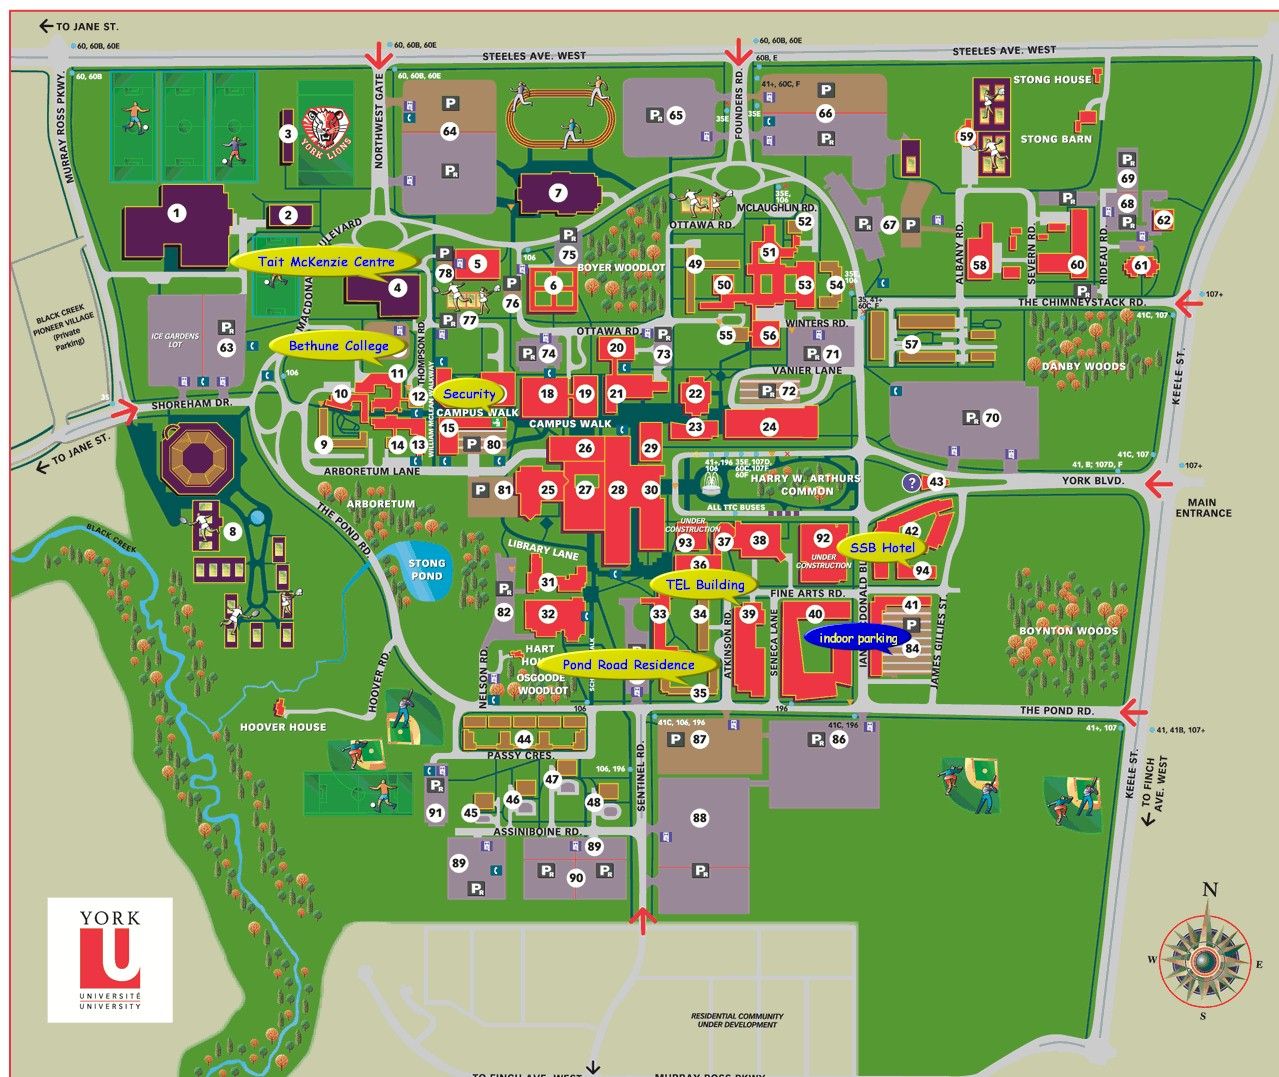 map of york university campus York University Keele Campus Map map of york university campus